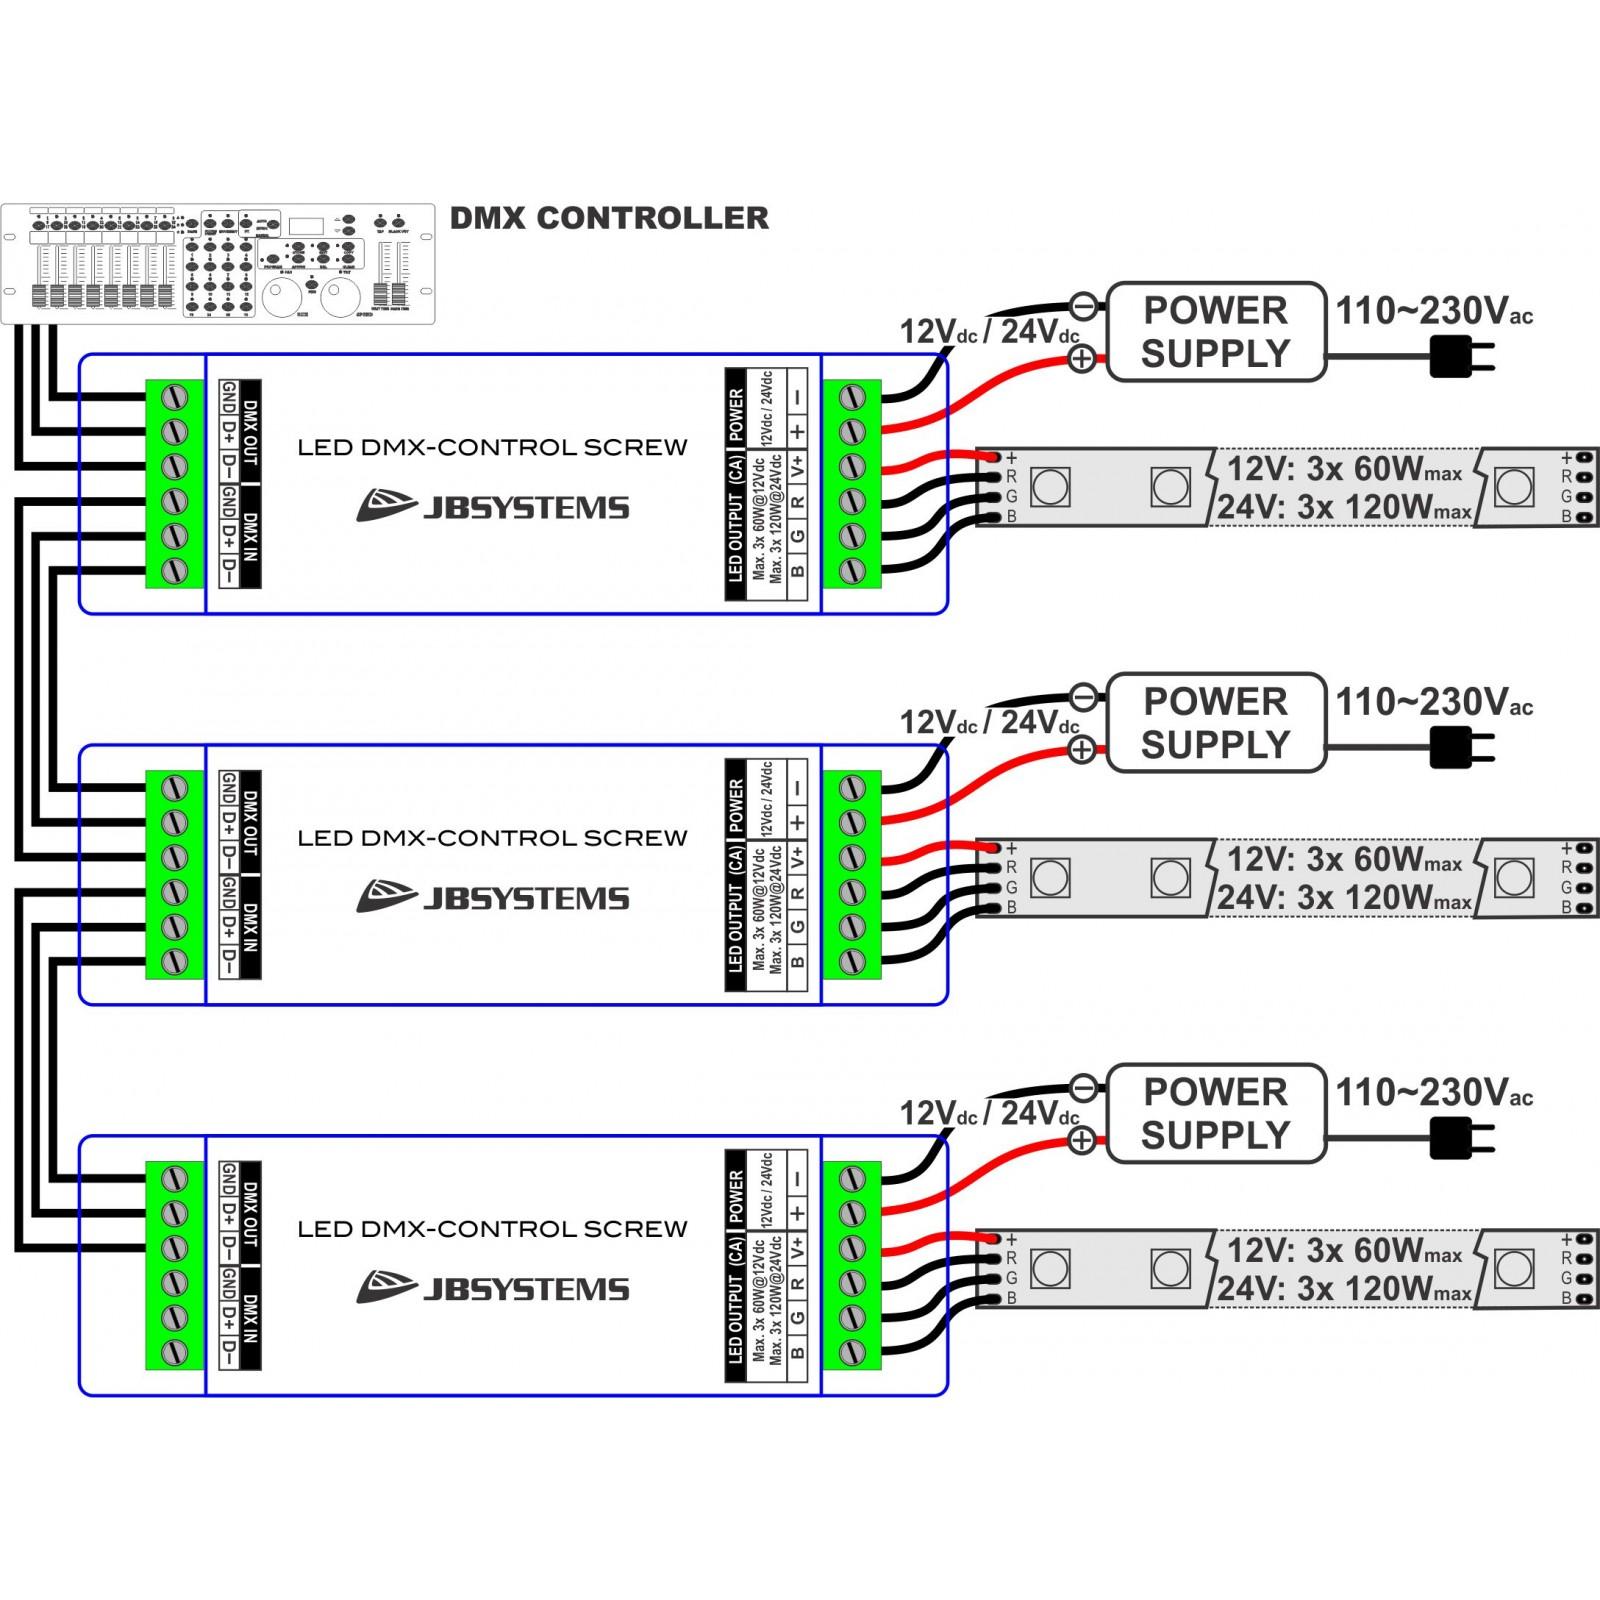 hight resolution of  dmx jb systems led dmx control controller psu on dmx switch diagram dali lighting circuit